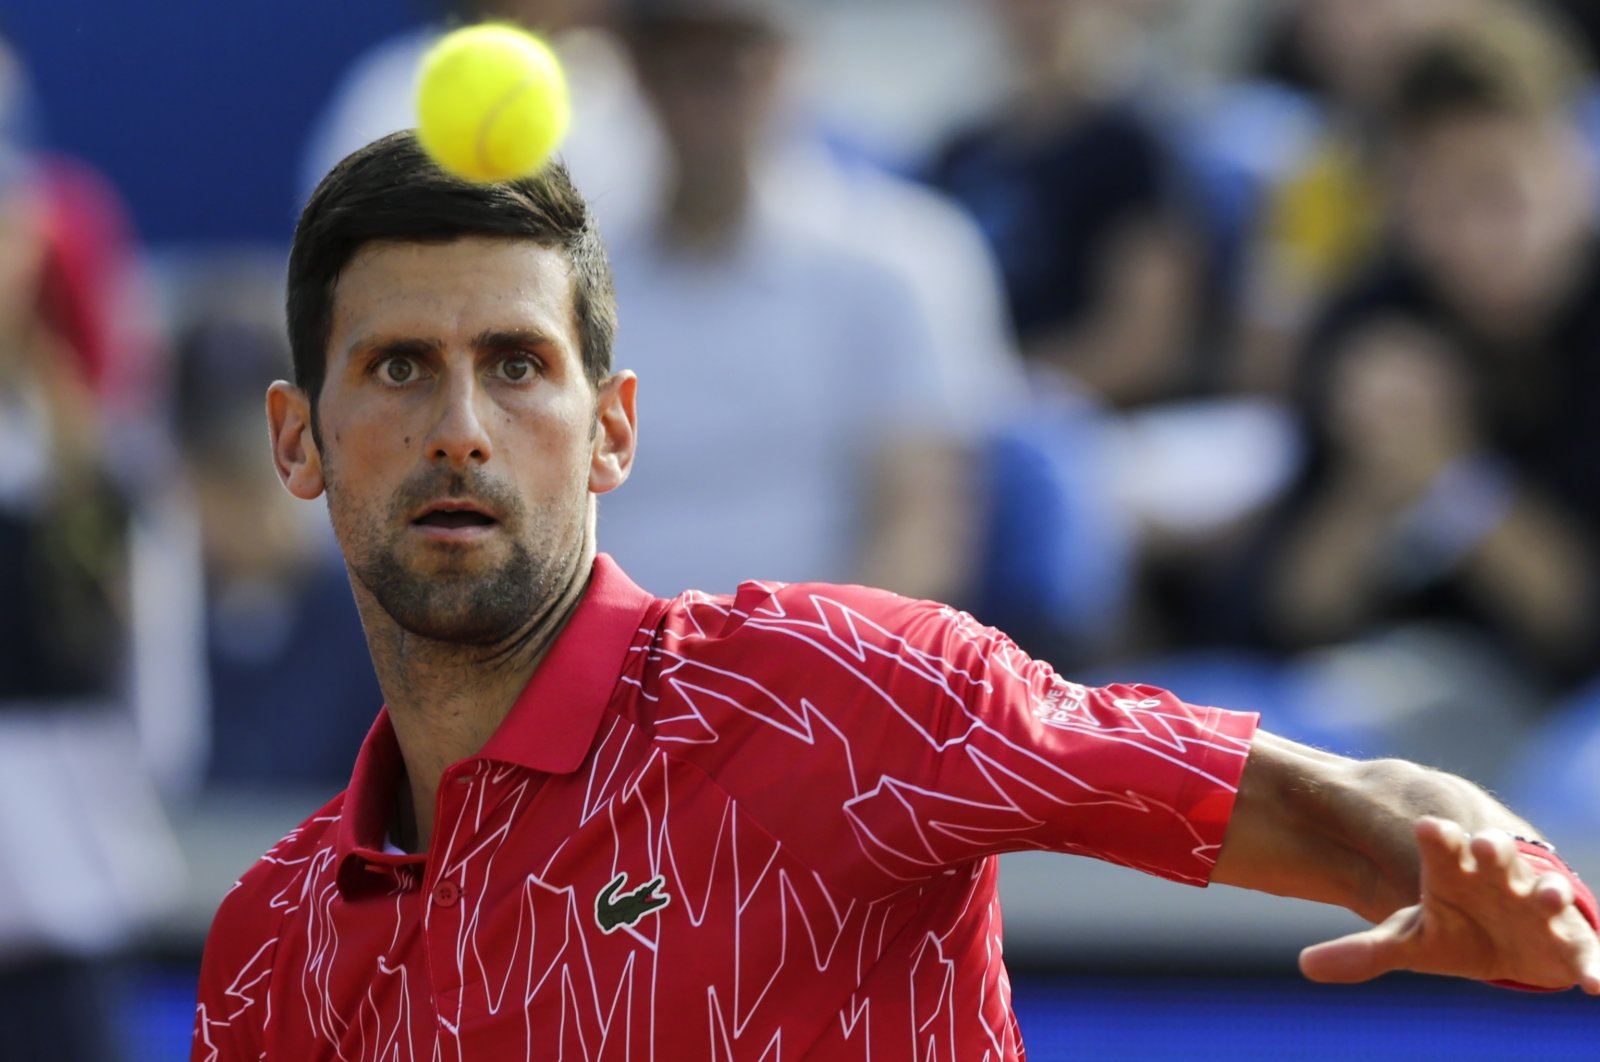 Novak Djokovic in action during the Adria Tour tennis tournament in Belgrade, Serbia, June 13, 2020. (EPA Photo)